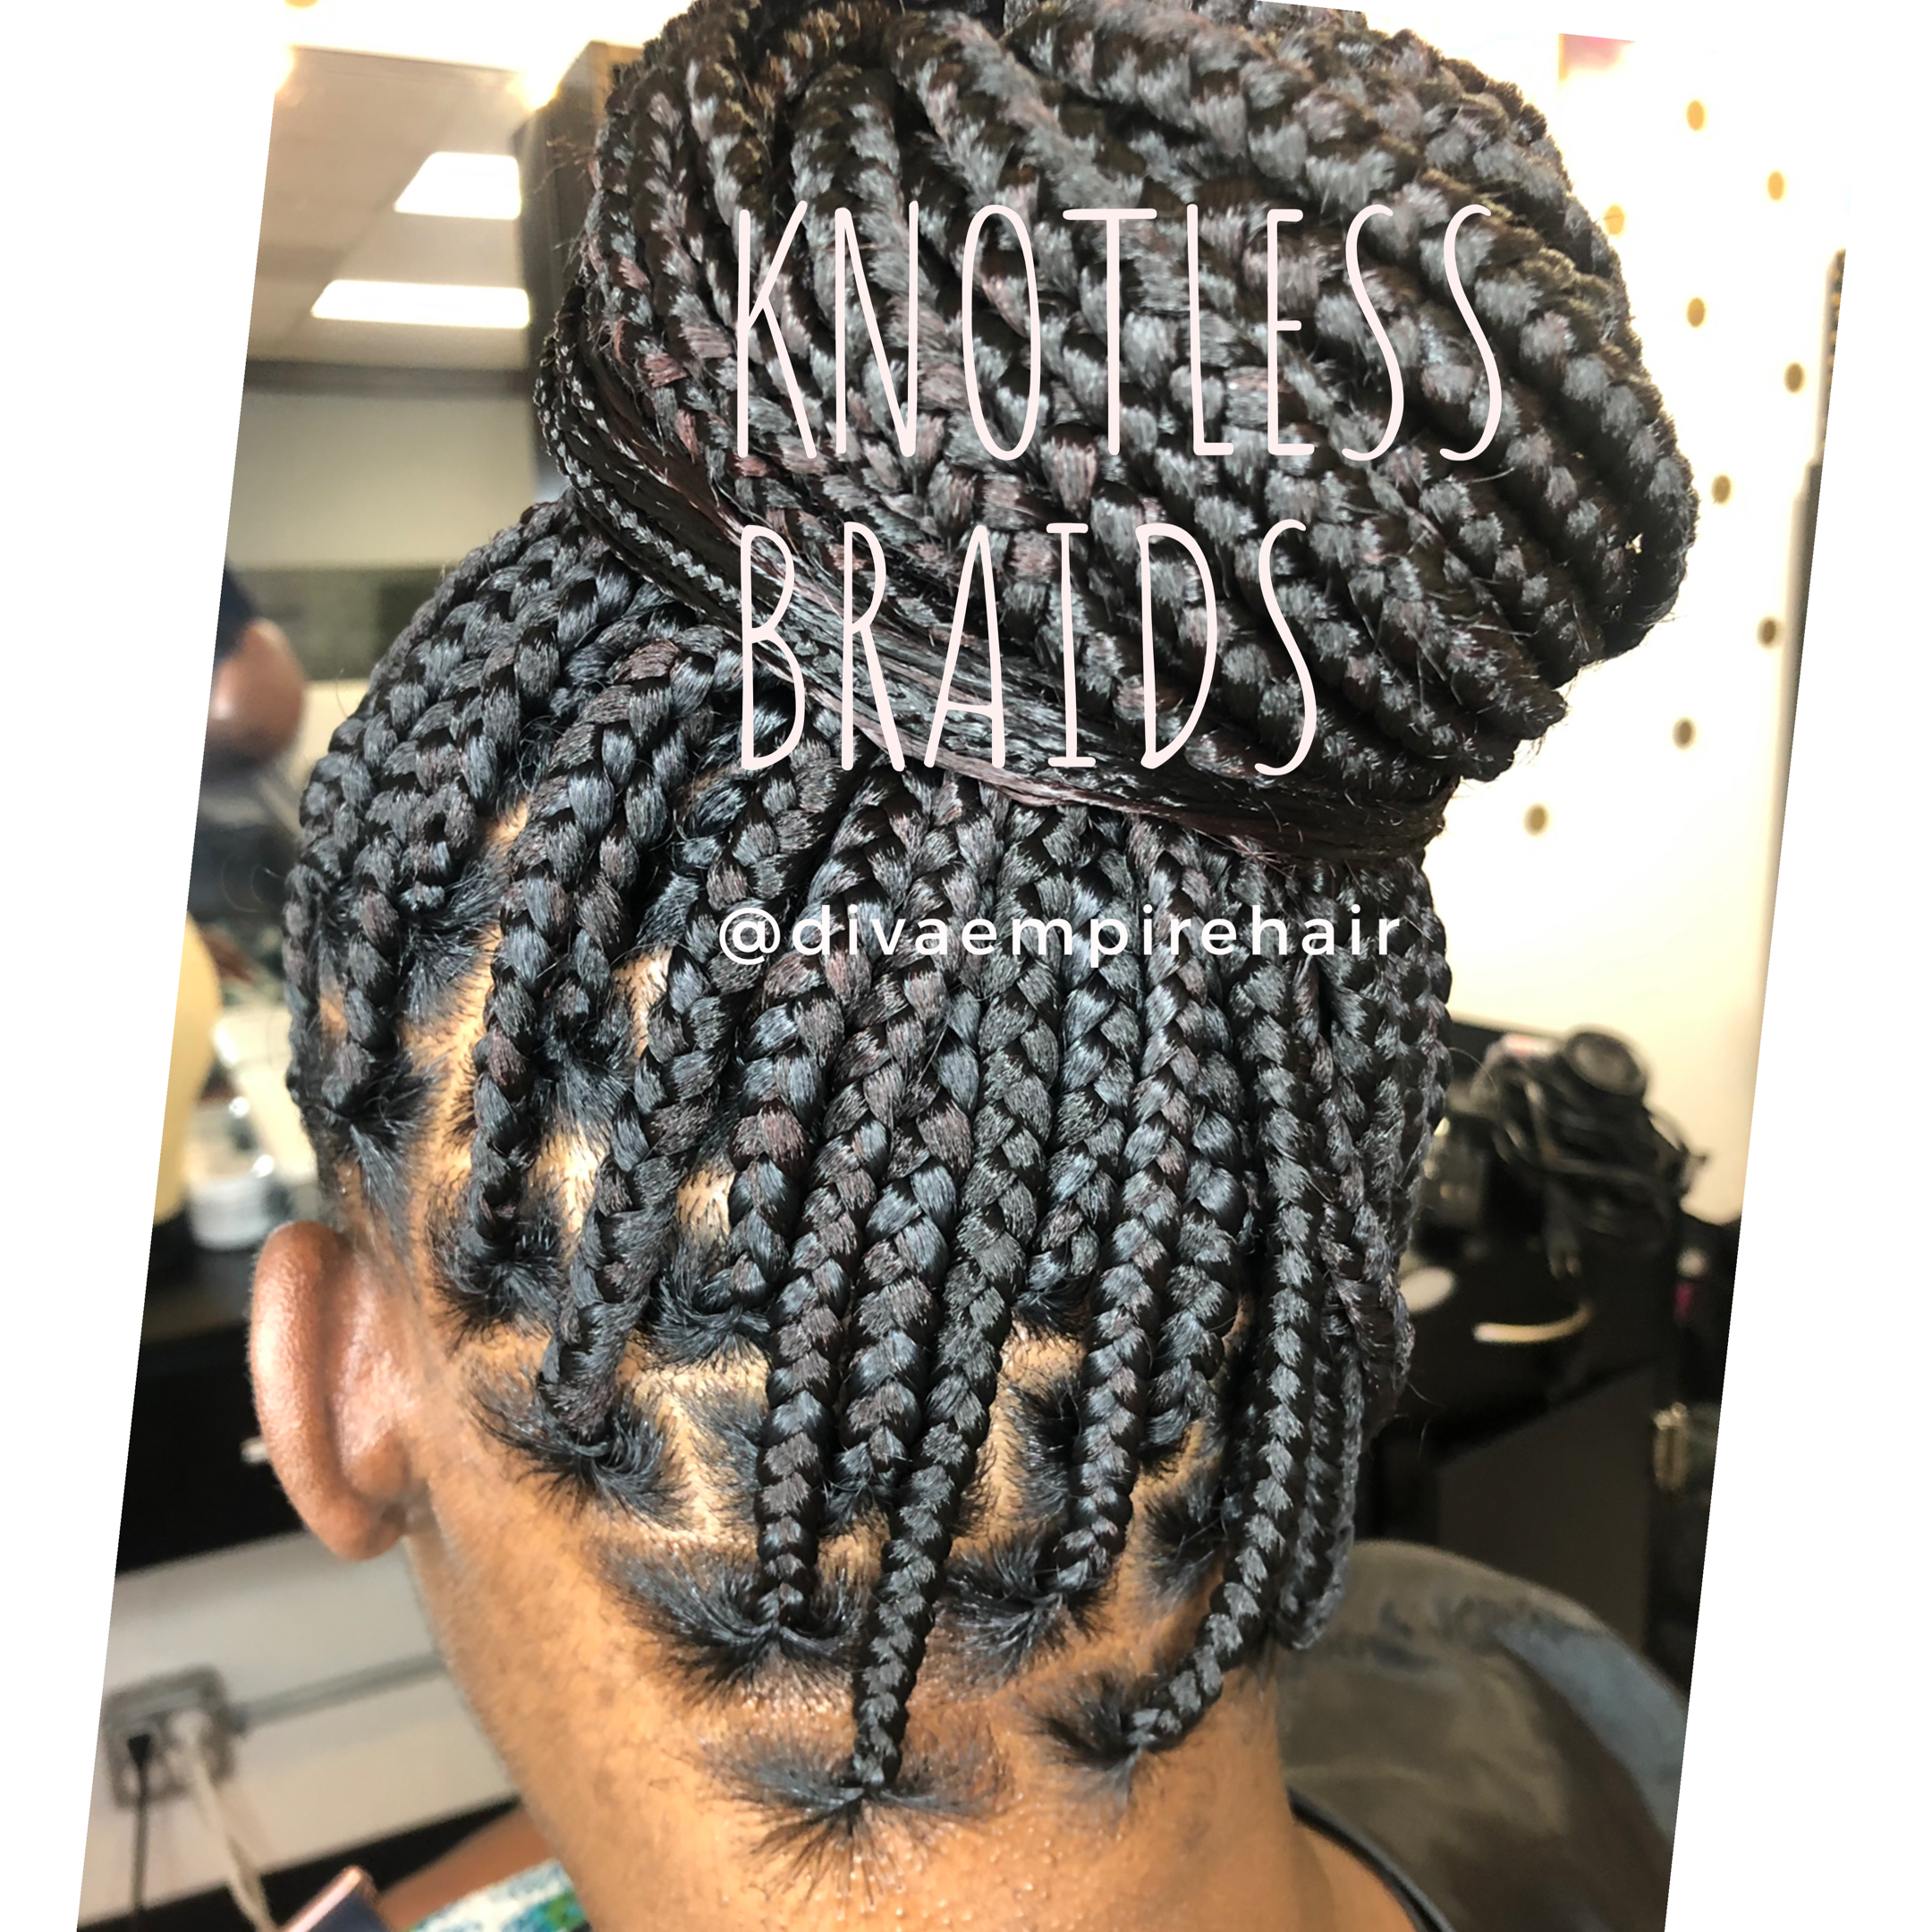 Knotless Braids Into A Bun Braided Updo Styles Braided Hairstyles Easy Braids Hairstyles Pictures